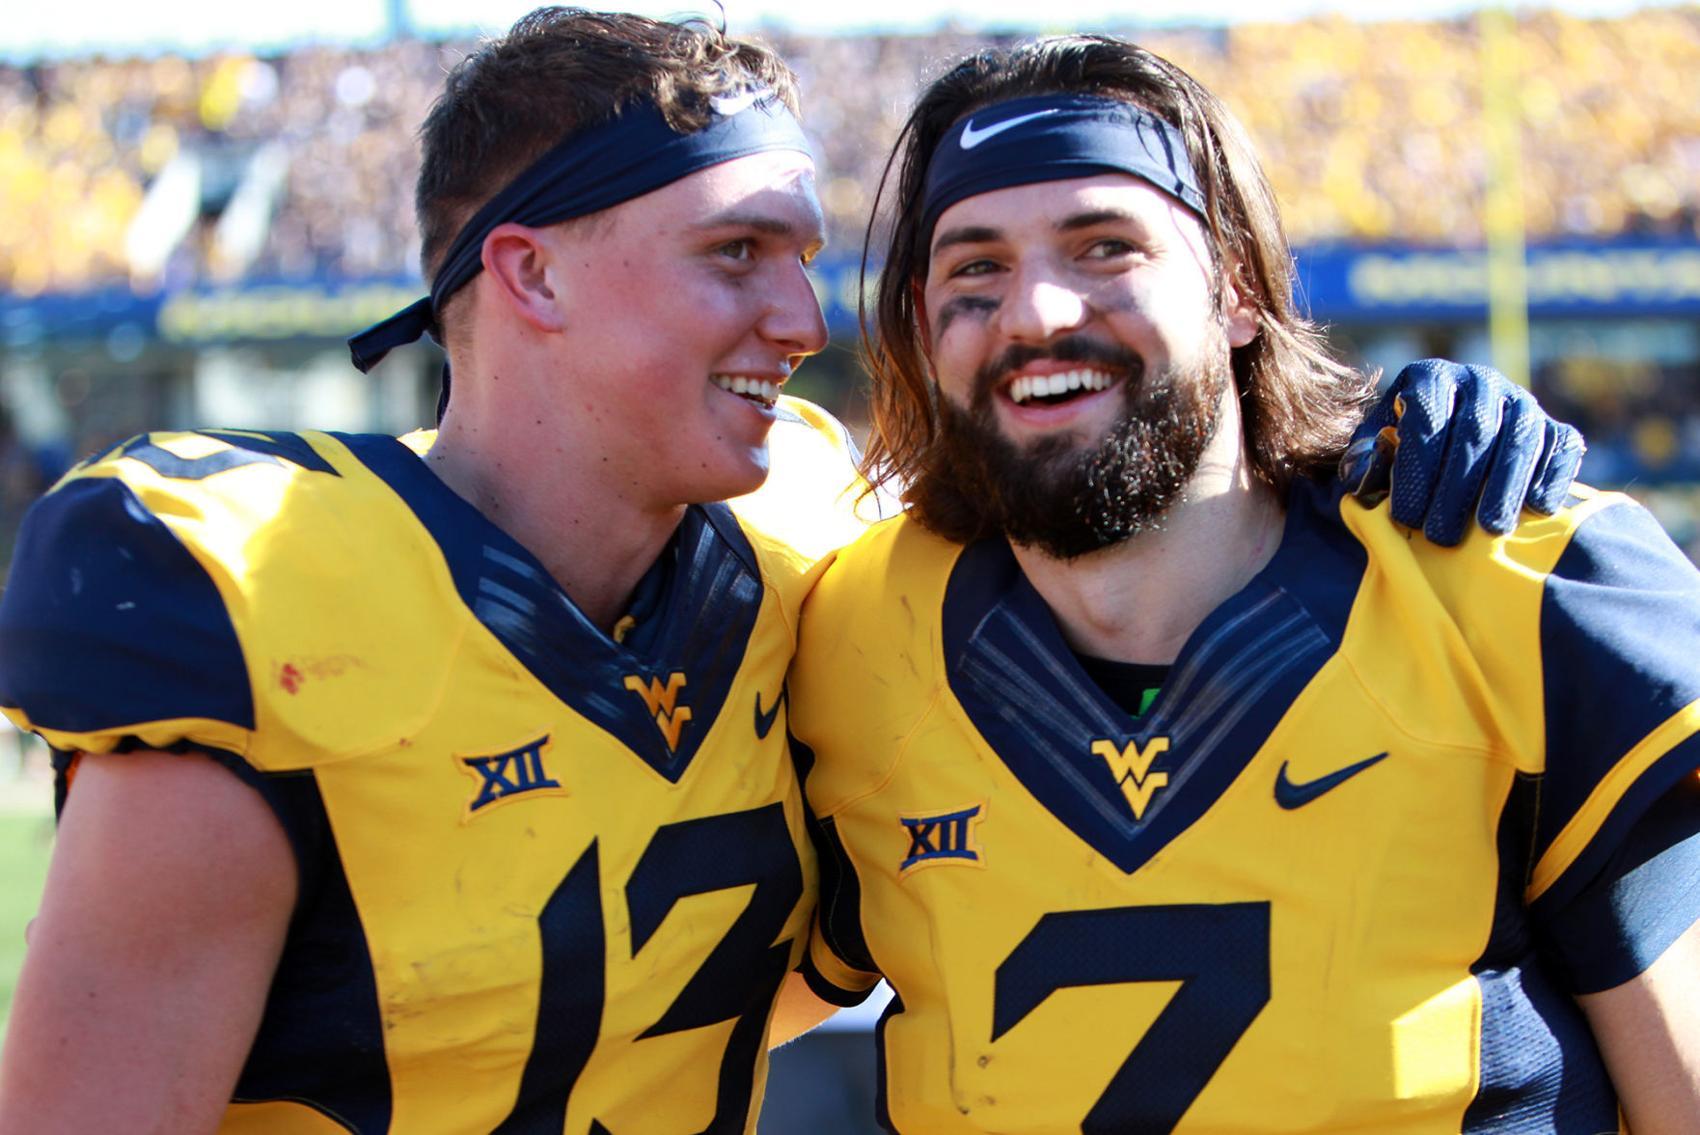 CBS Sports Week 1 Picks: 'West Virginia is a No-Brainer Best Bet'